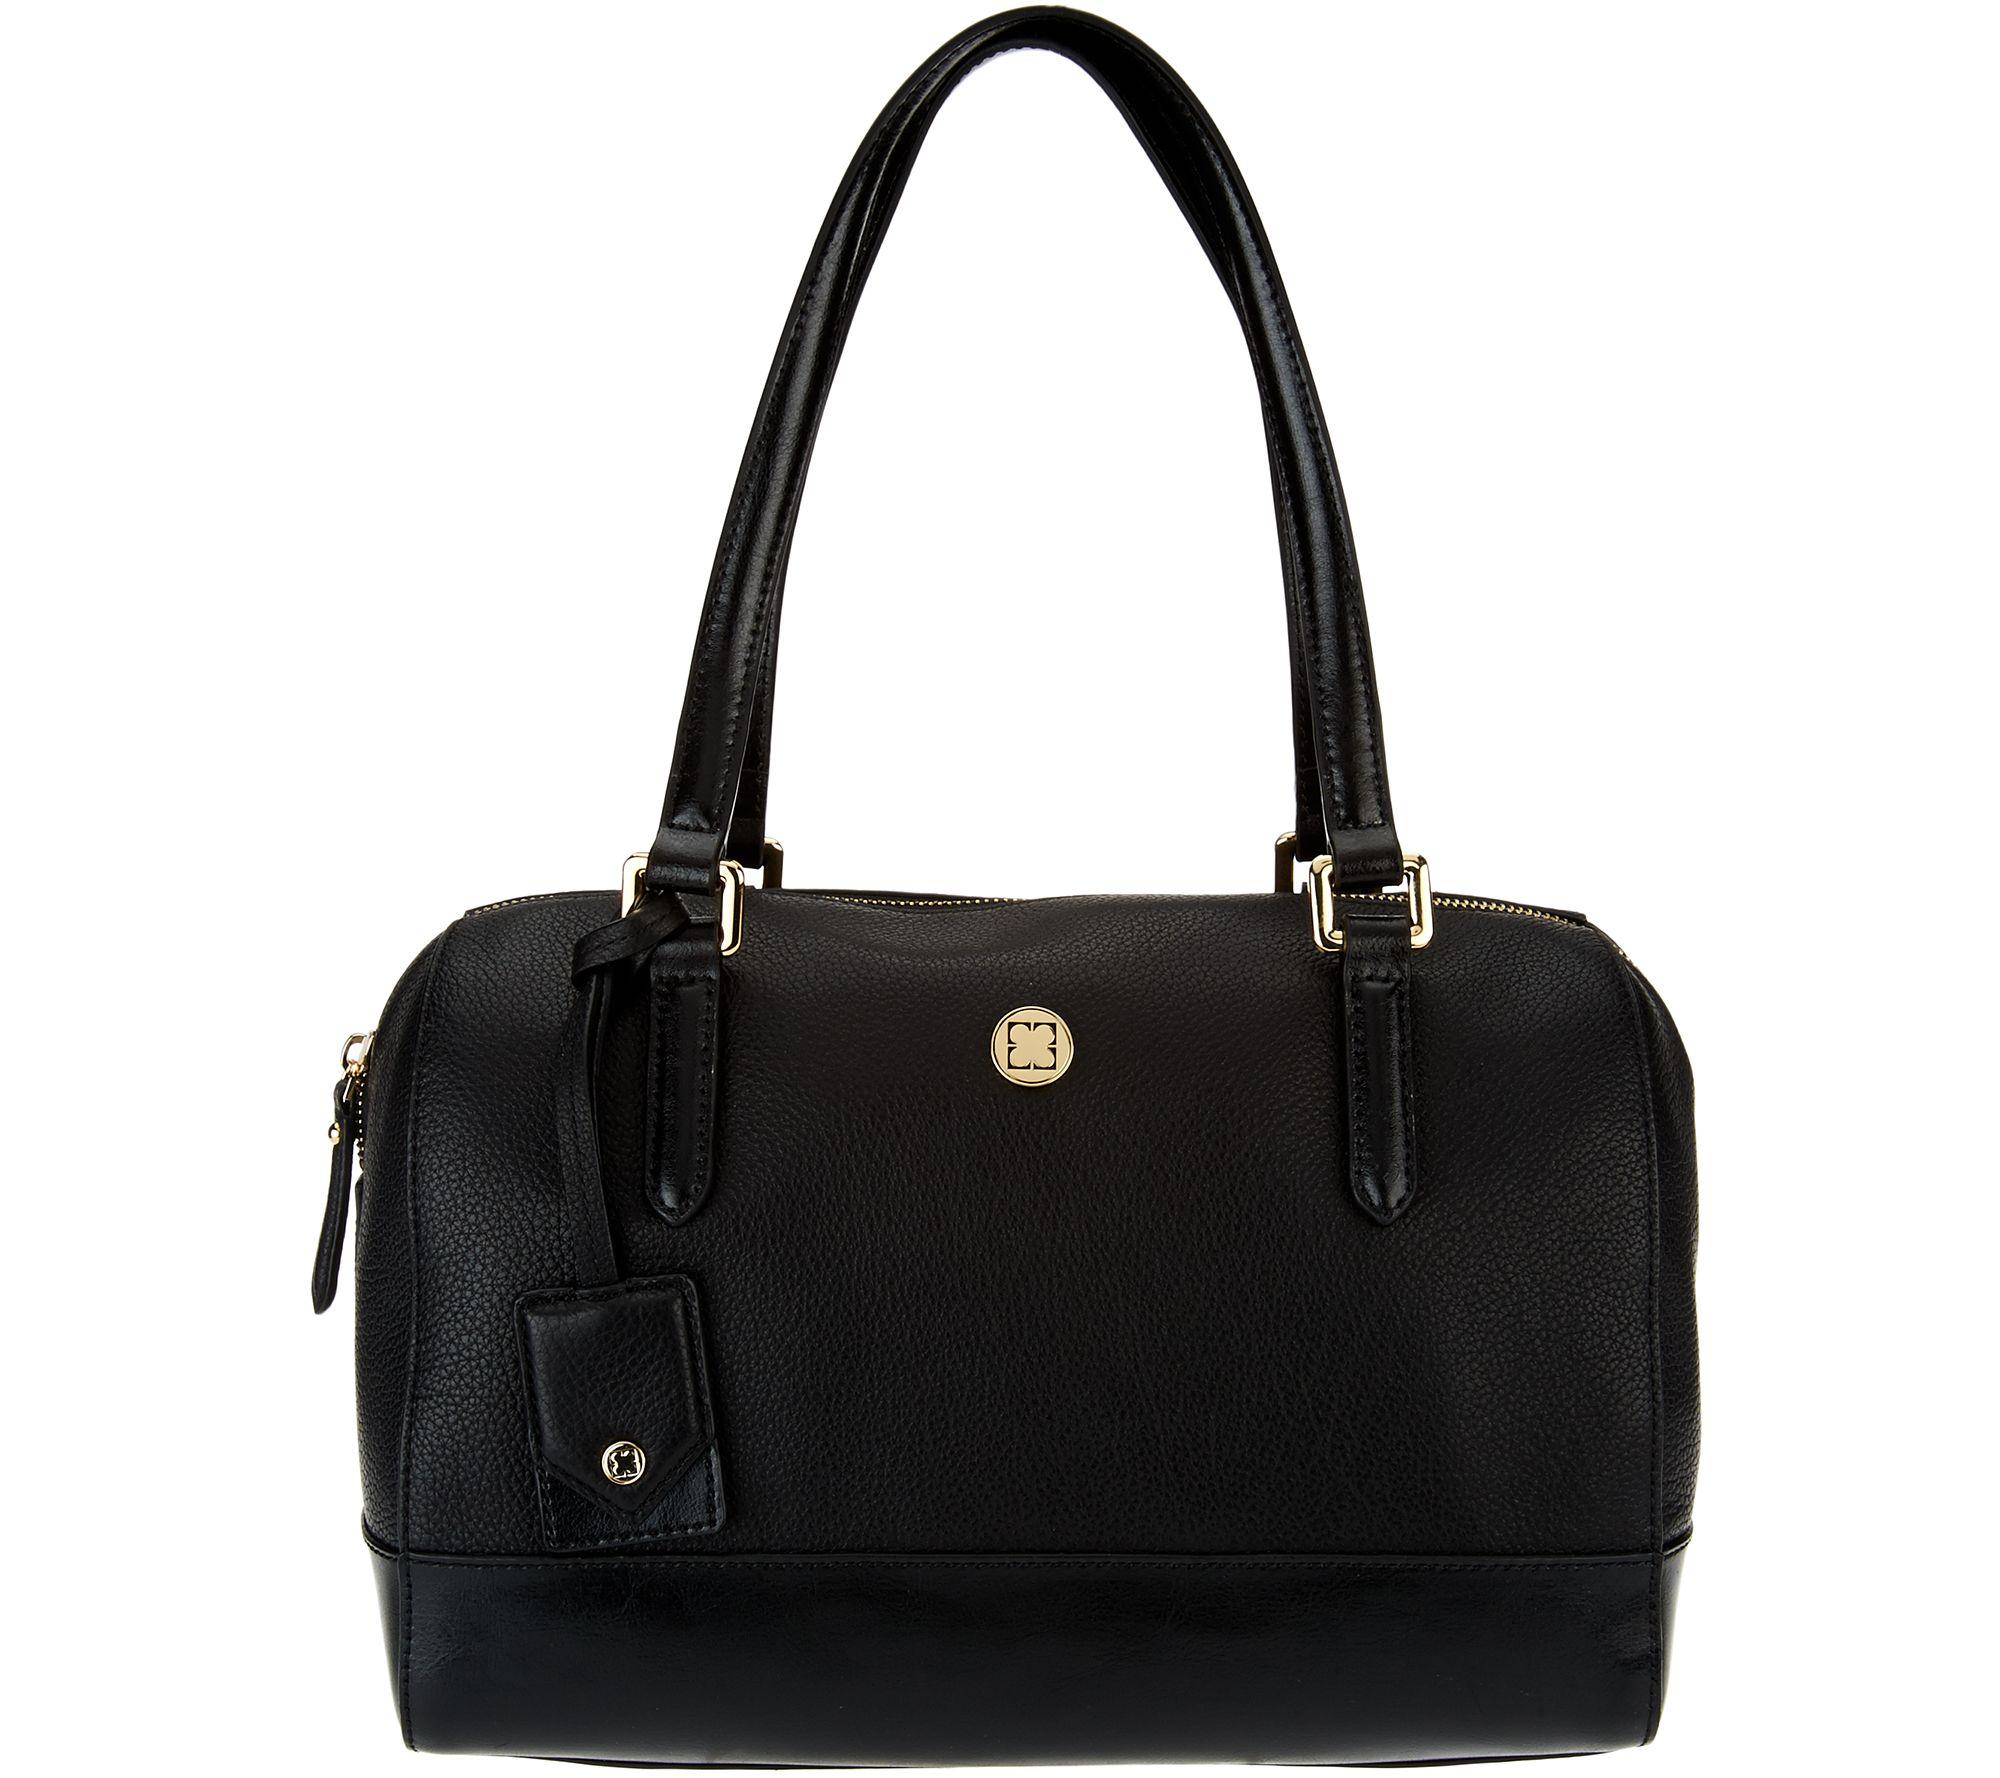 6234ed0608 Liz Claiborne New York Heritage Collection Leather Handbag - Page 1 —  QVC.com